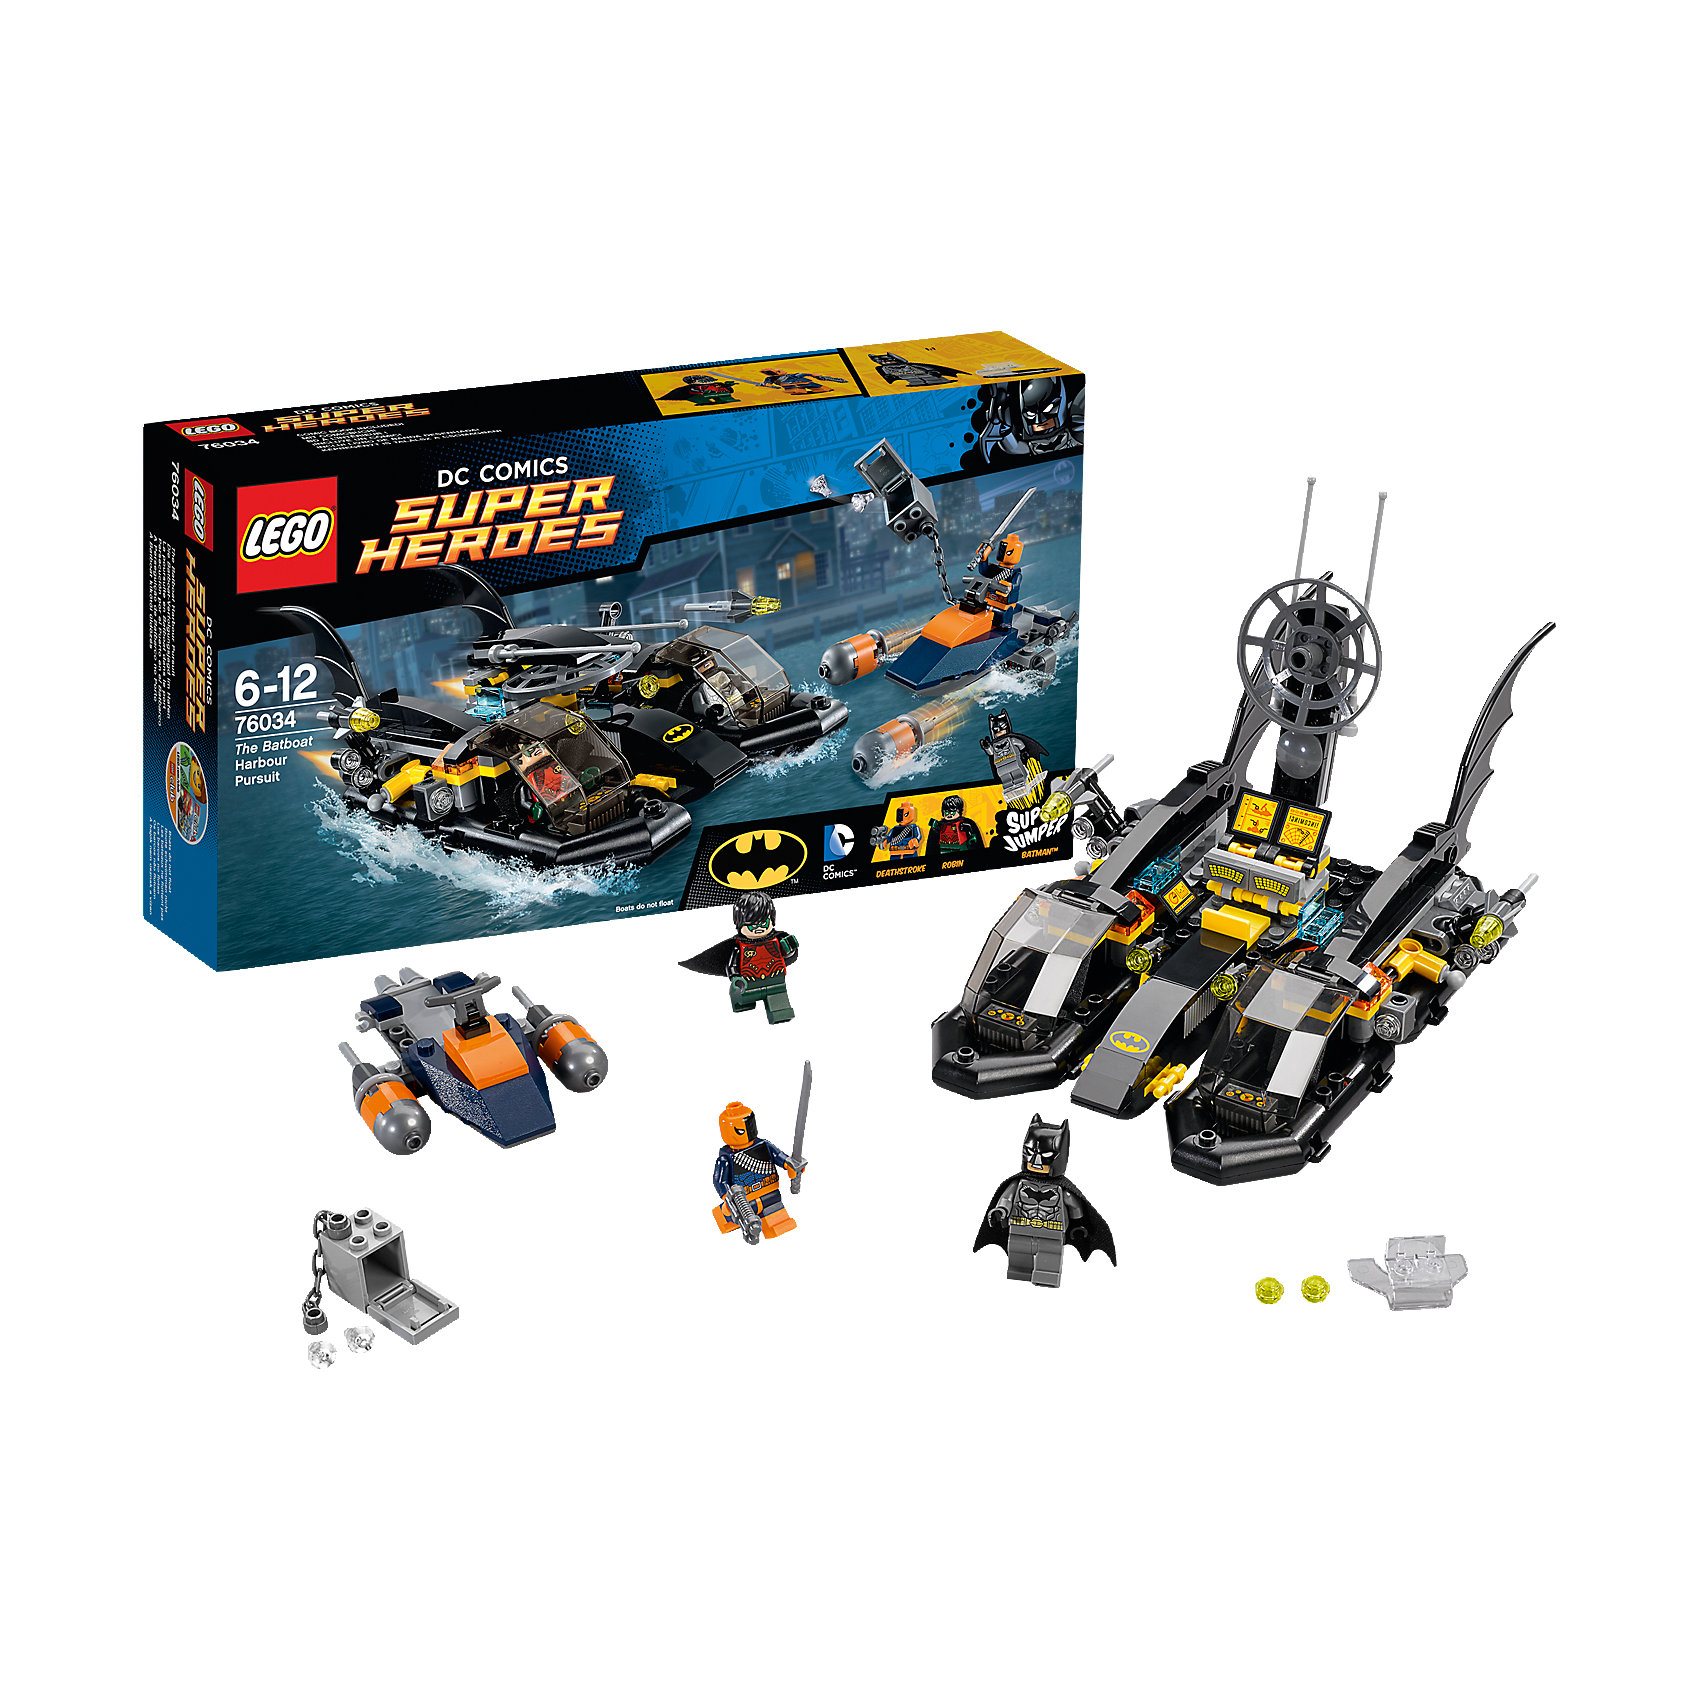 LEGO LEGO Super Heroes 76034: Погоня в бухте на Бэткатере lego lego super heroes 76049 реактивный самолёт мстителей космическая миссия